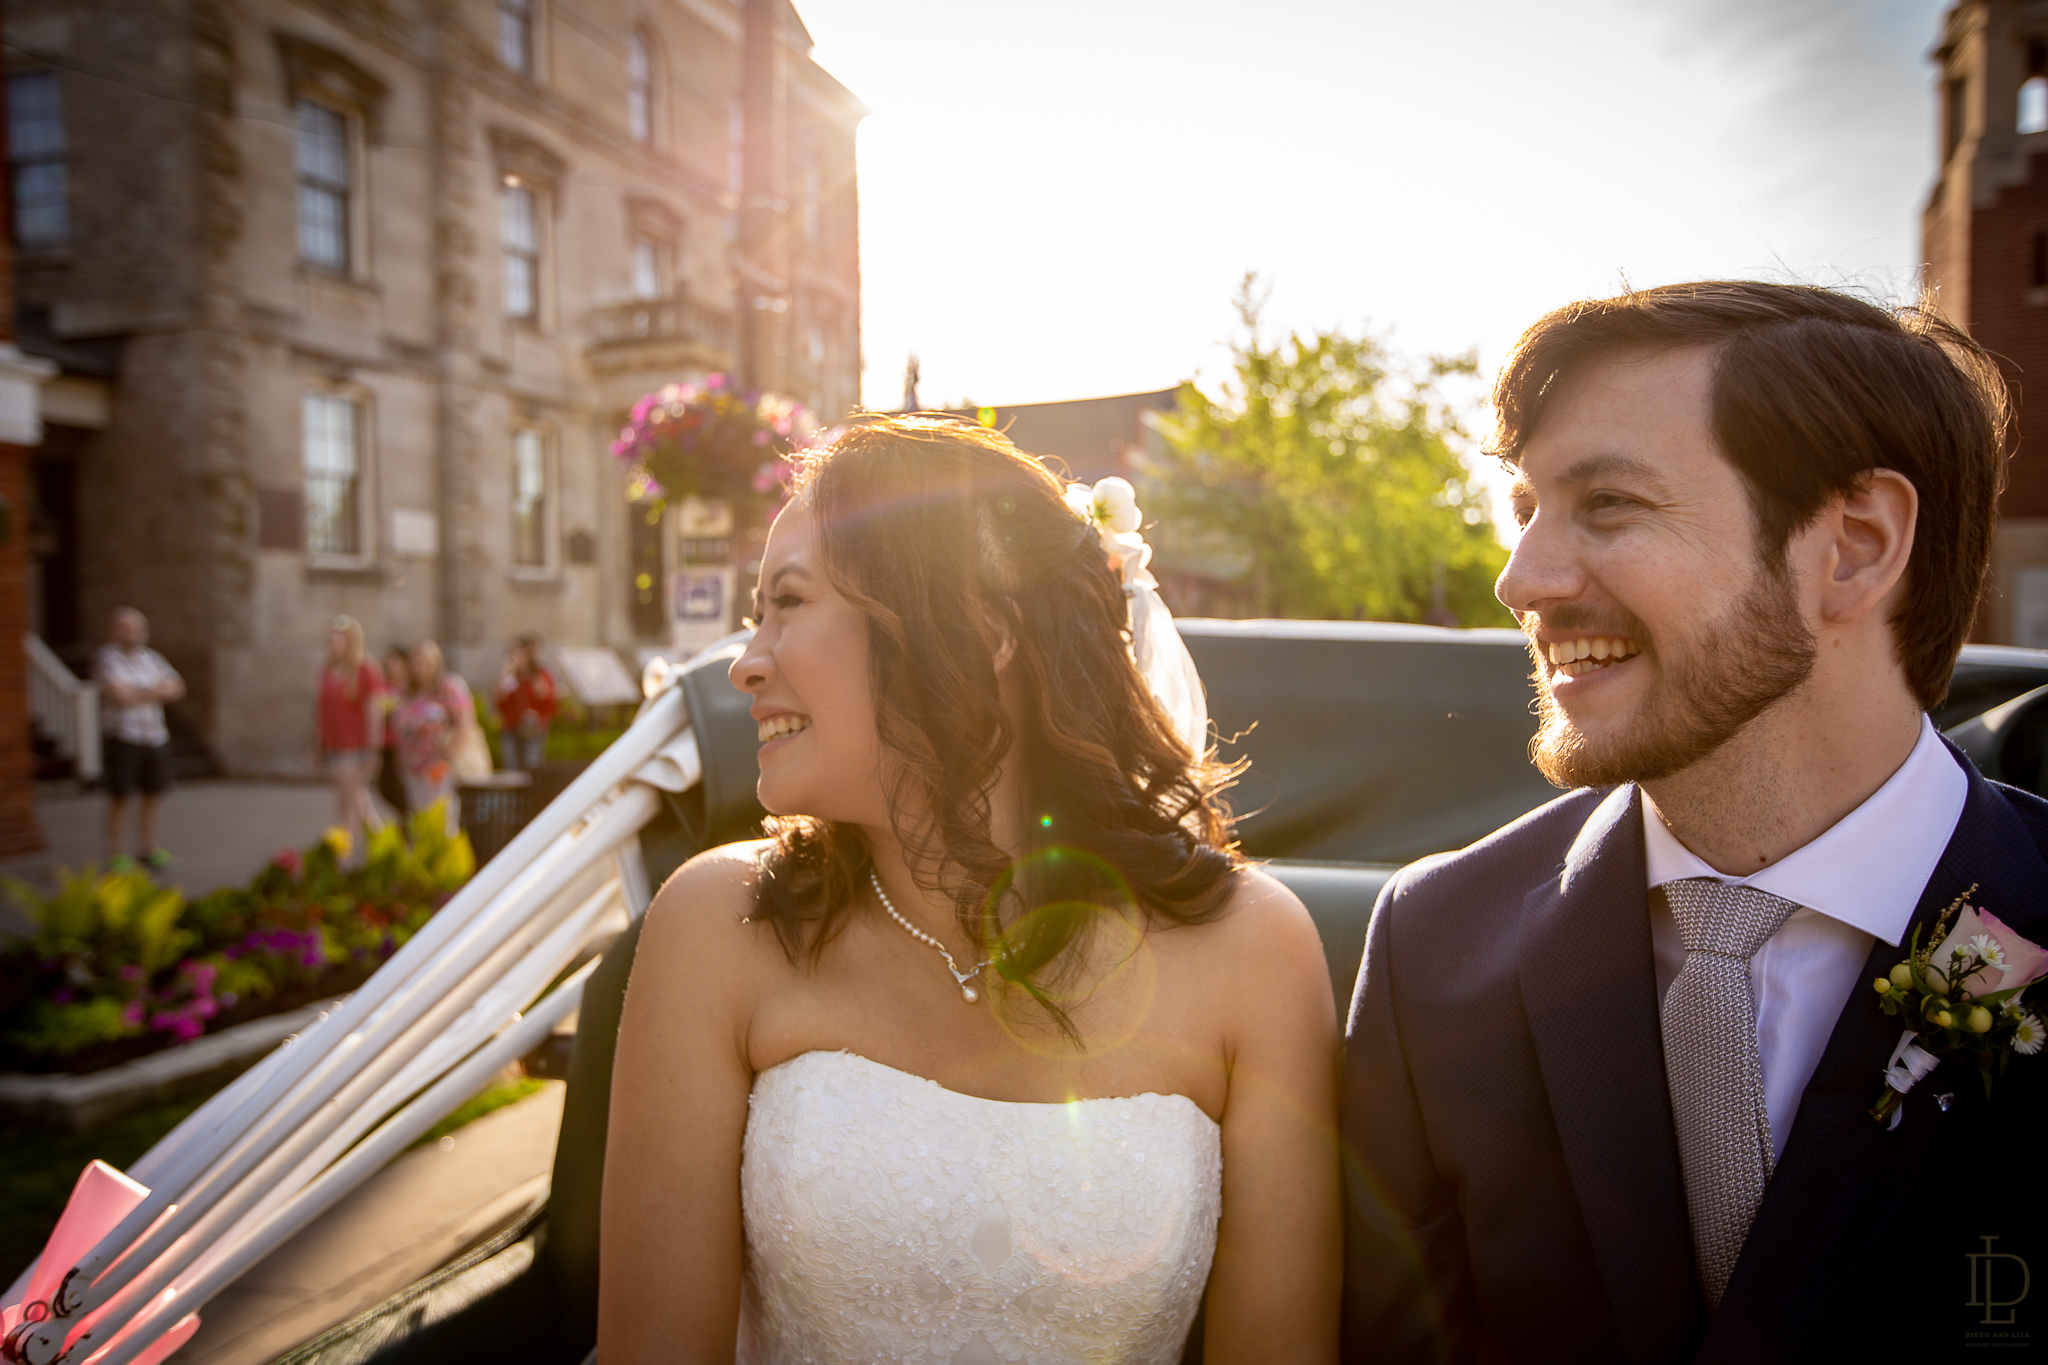 Toronto-wedding-Photograper-46.jpg